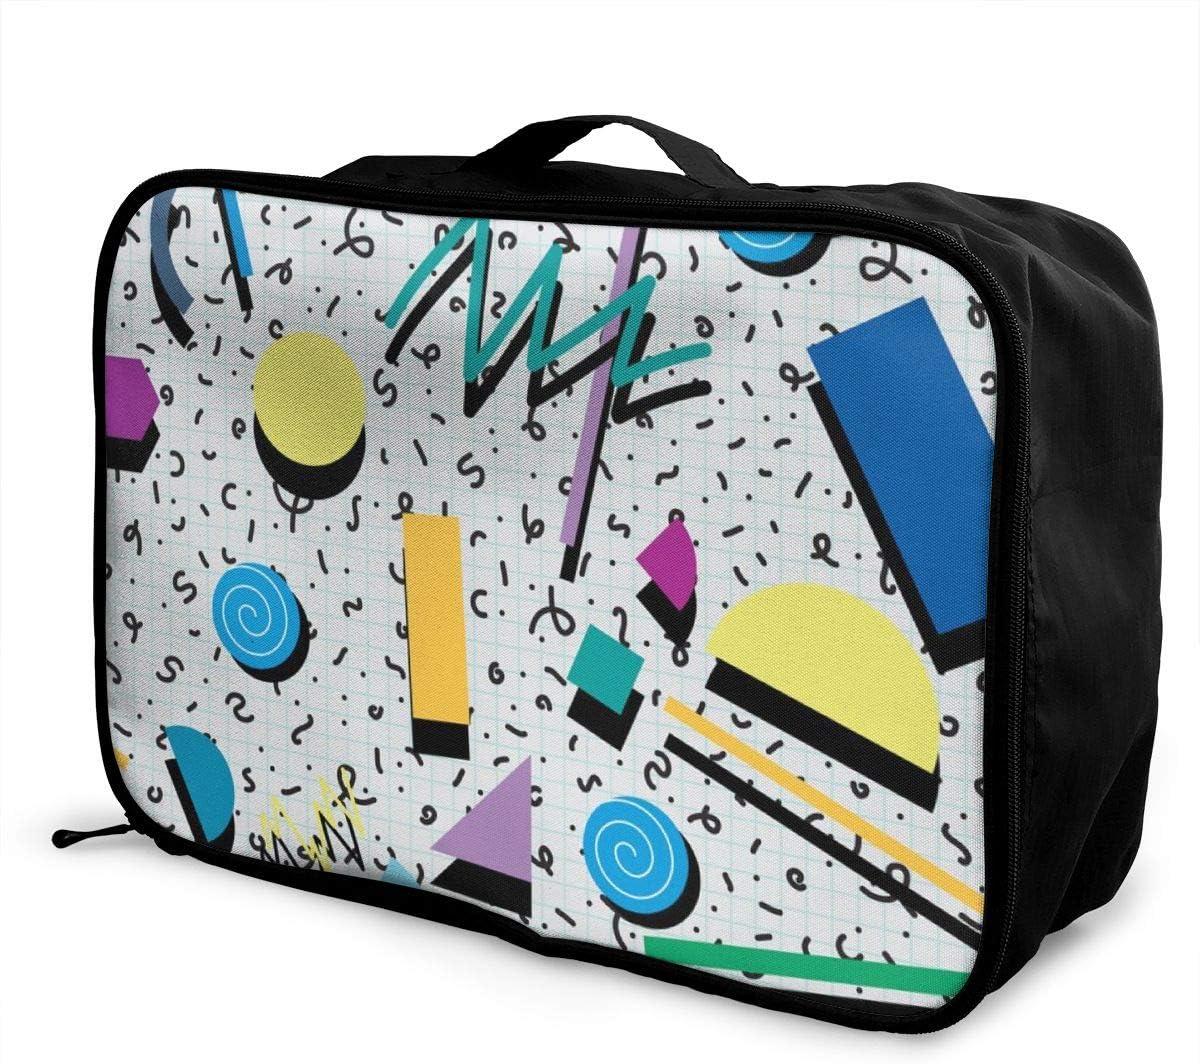 Yunshm Irregular Shape Yellow Blue Customized Trolley Handbag Waterproof Unisex Large Capacity For Business Travel Storage